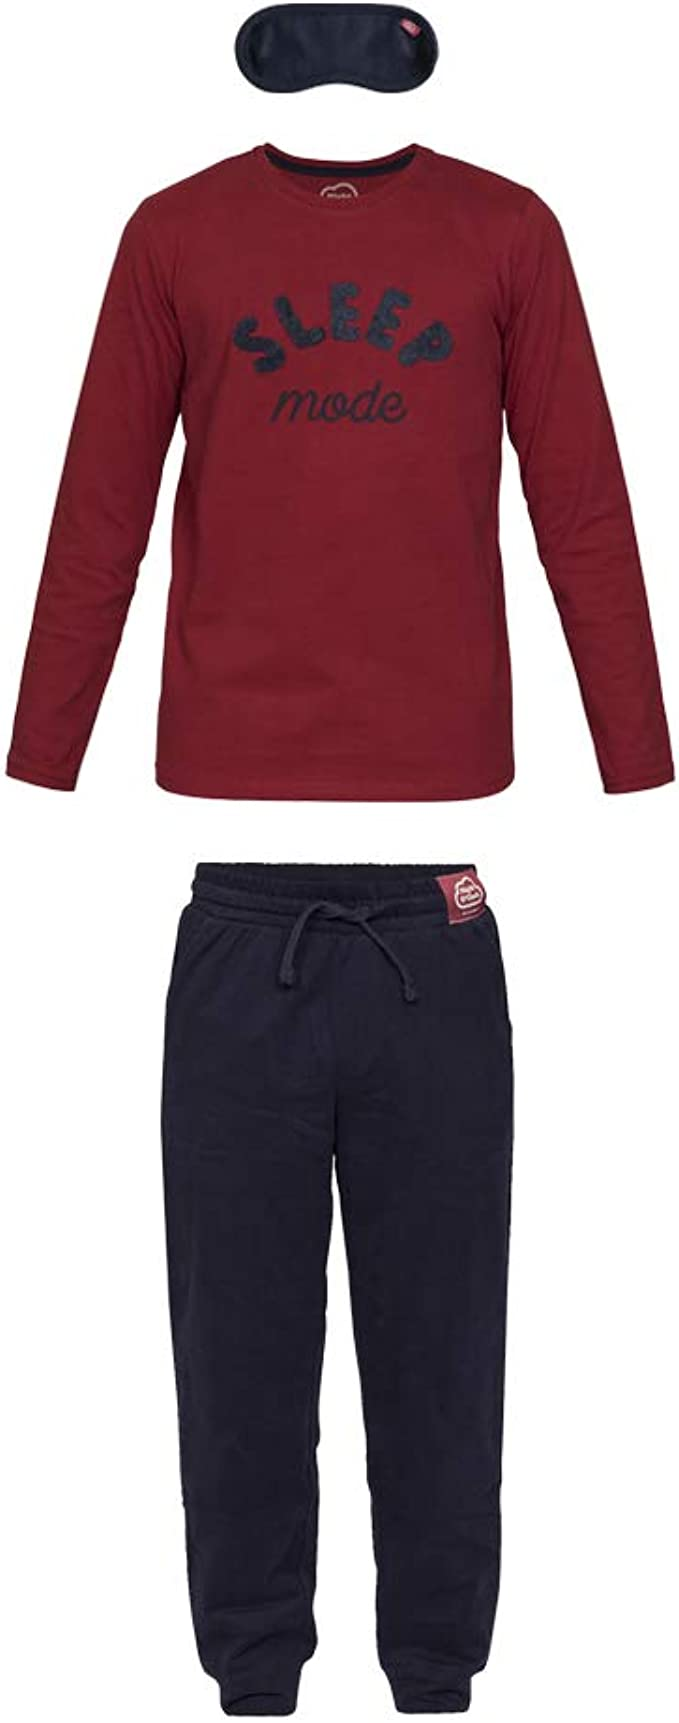 Nightoclock Bleep Conjunto de Pijama para niño en algodón orgánico e Antifaz